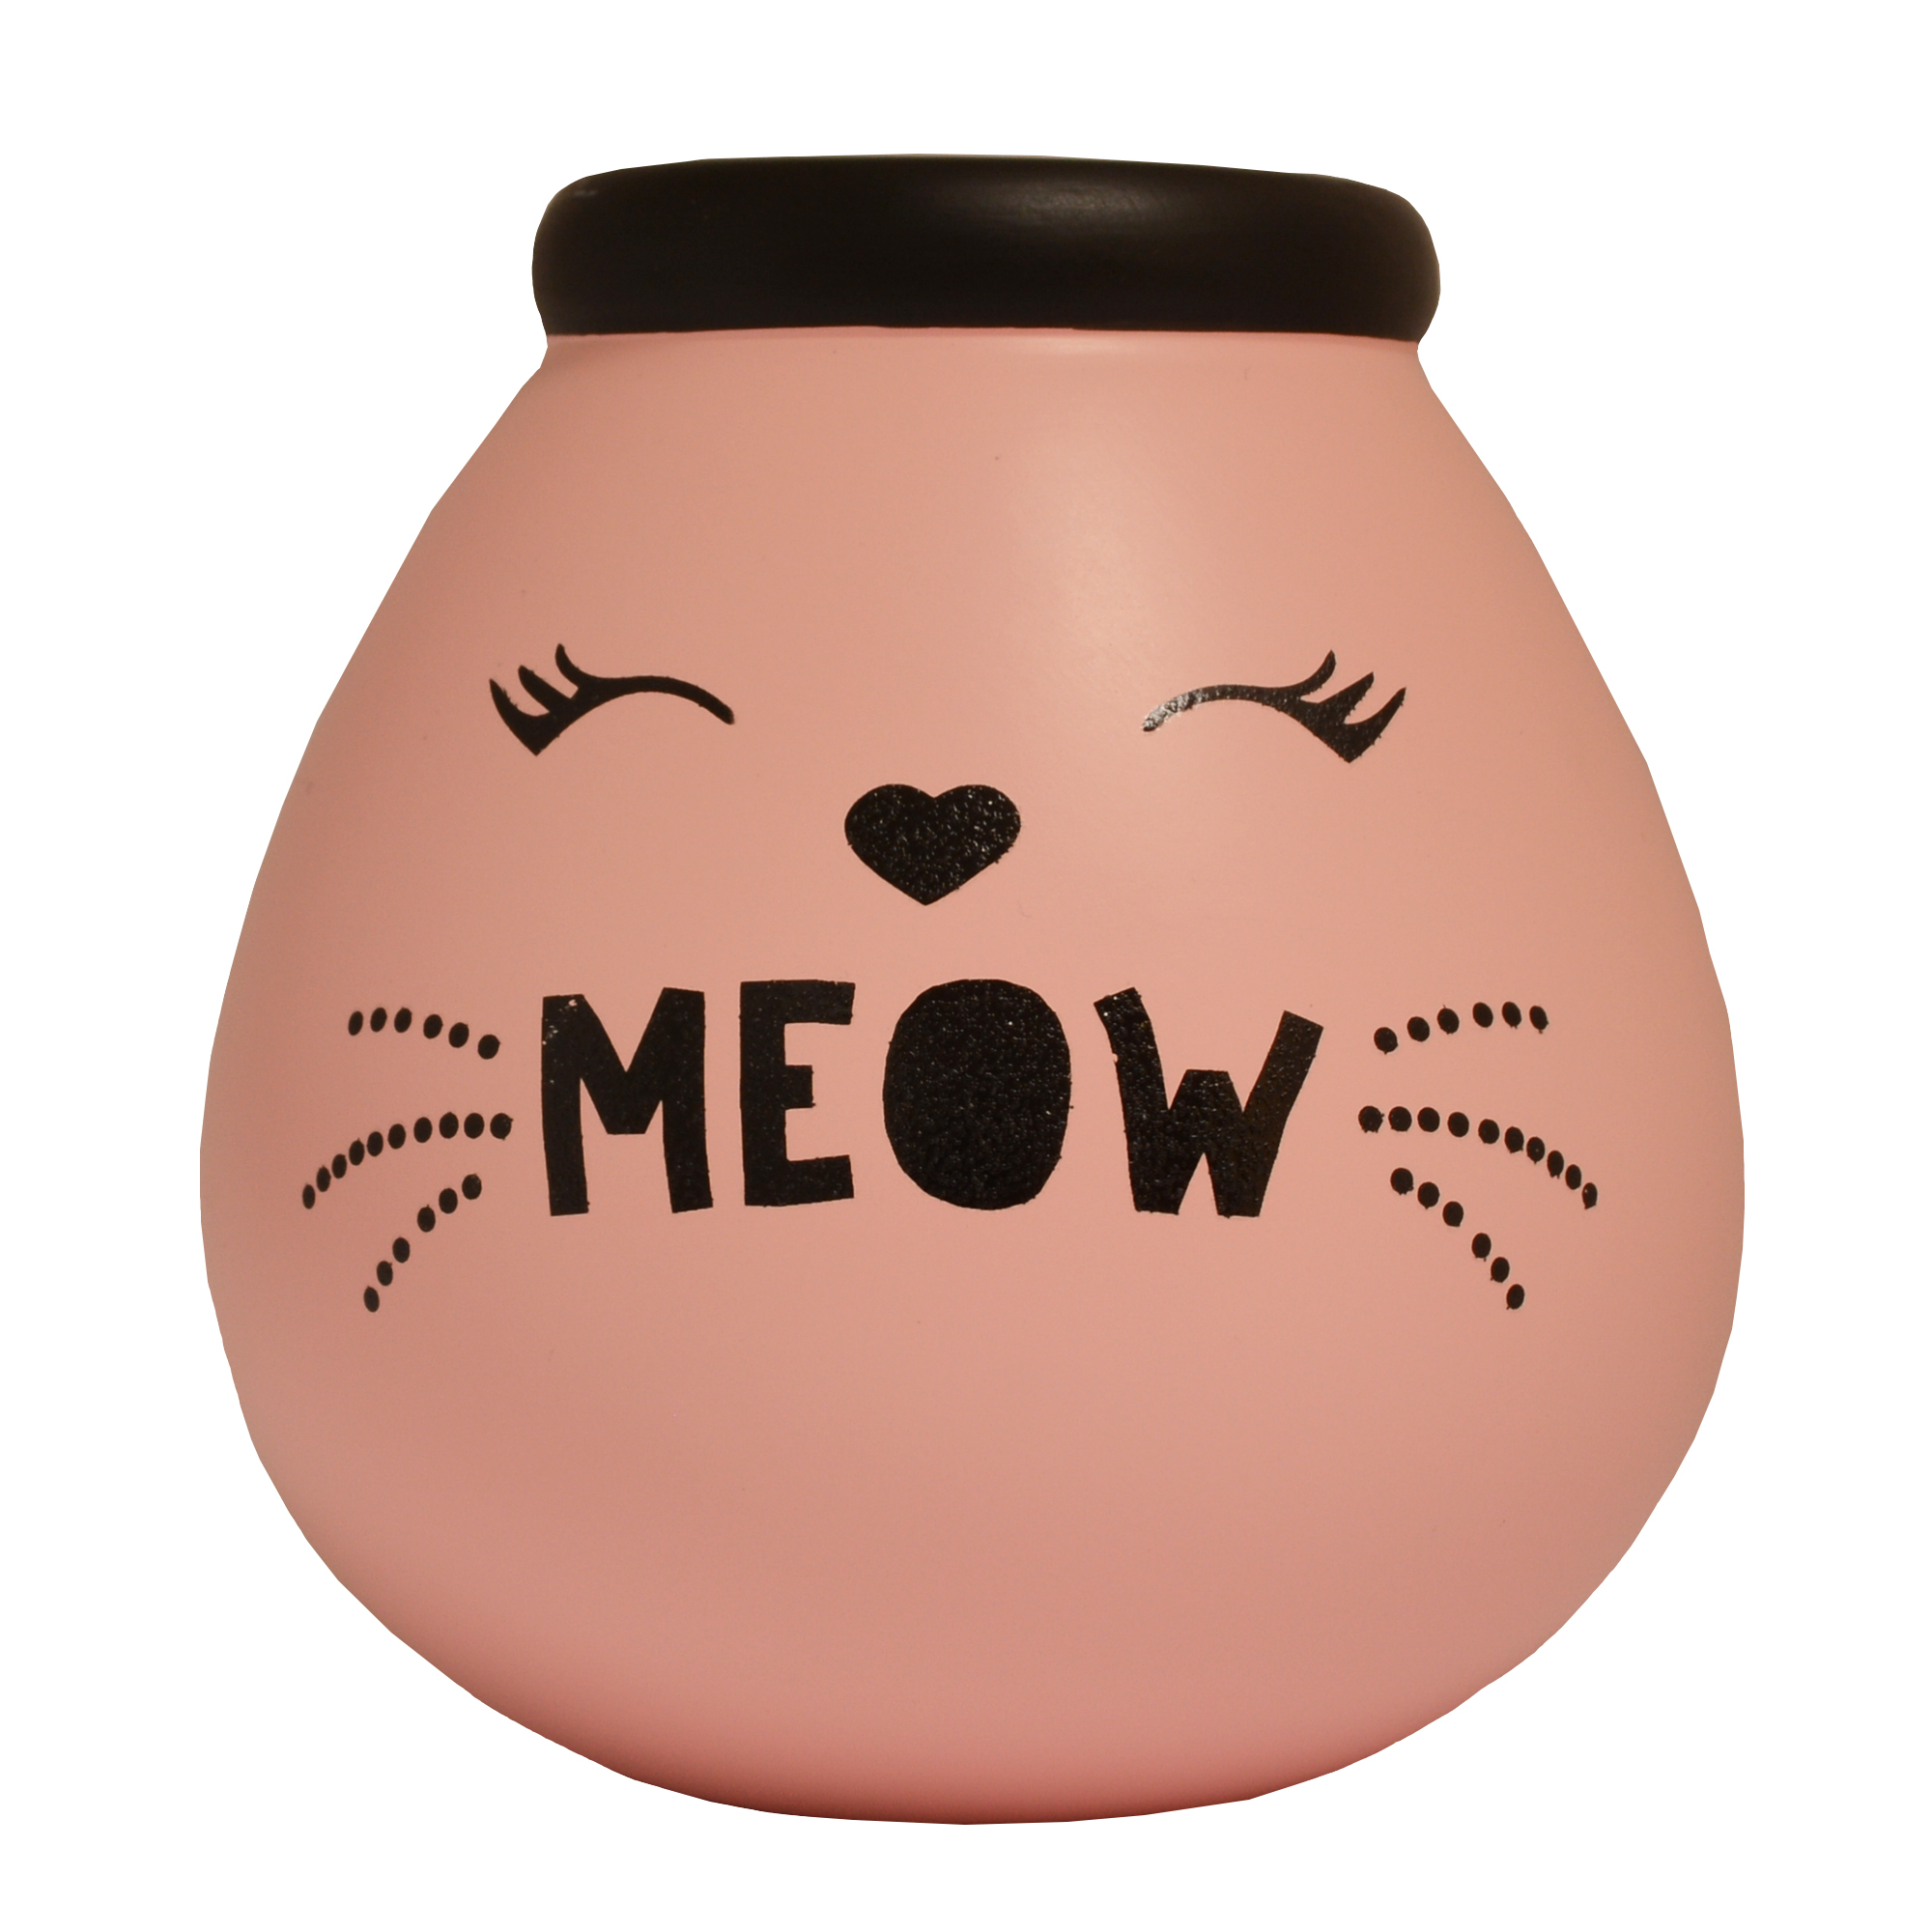 Meow Cat Pots of Dreams Money Pot Save Up /& Smash Money Box Gift